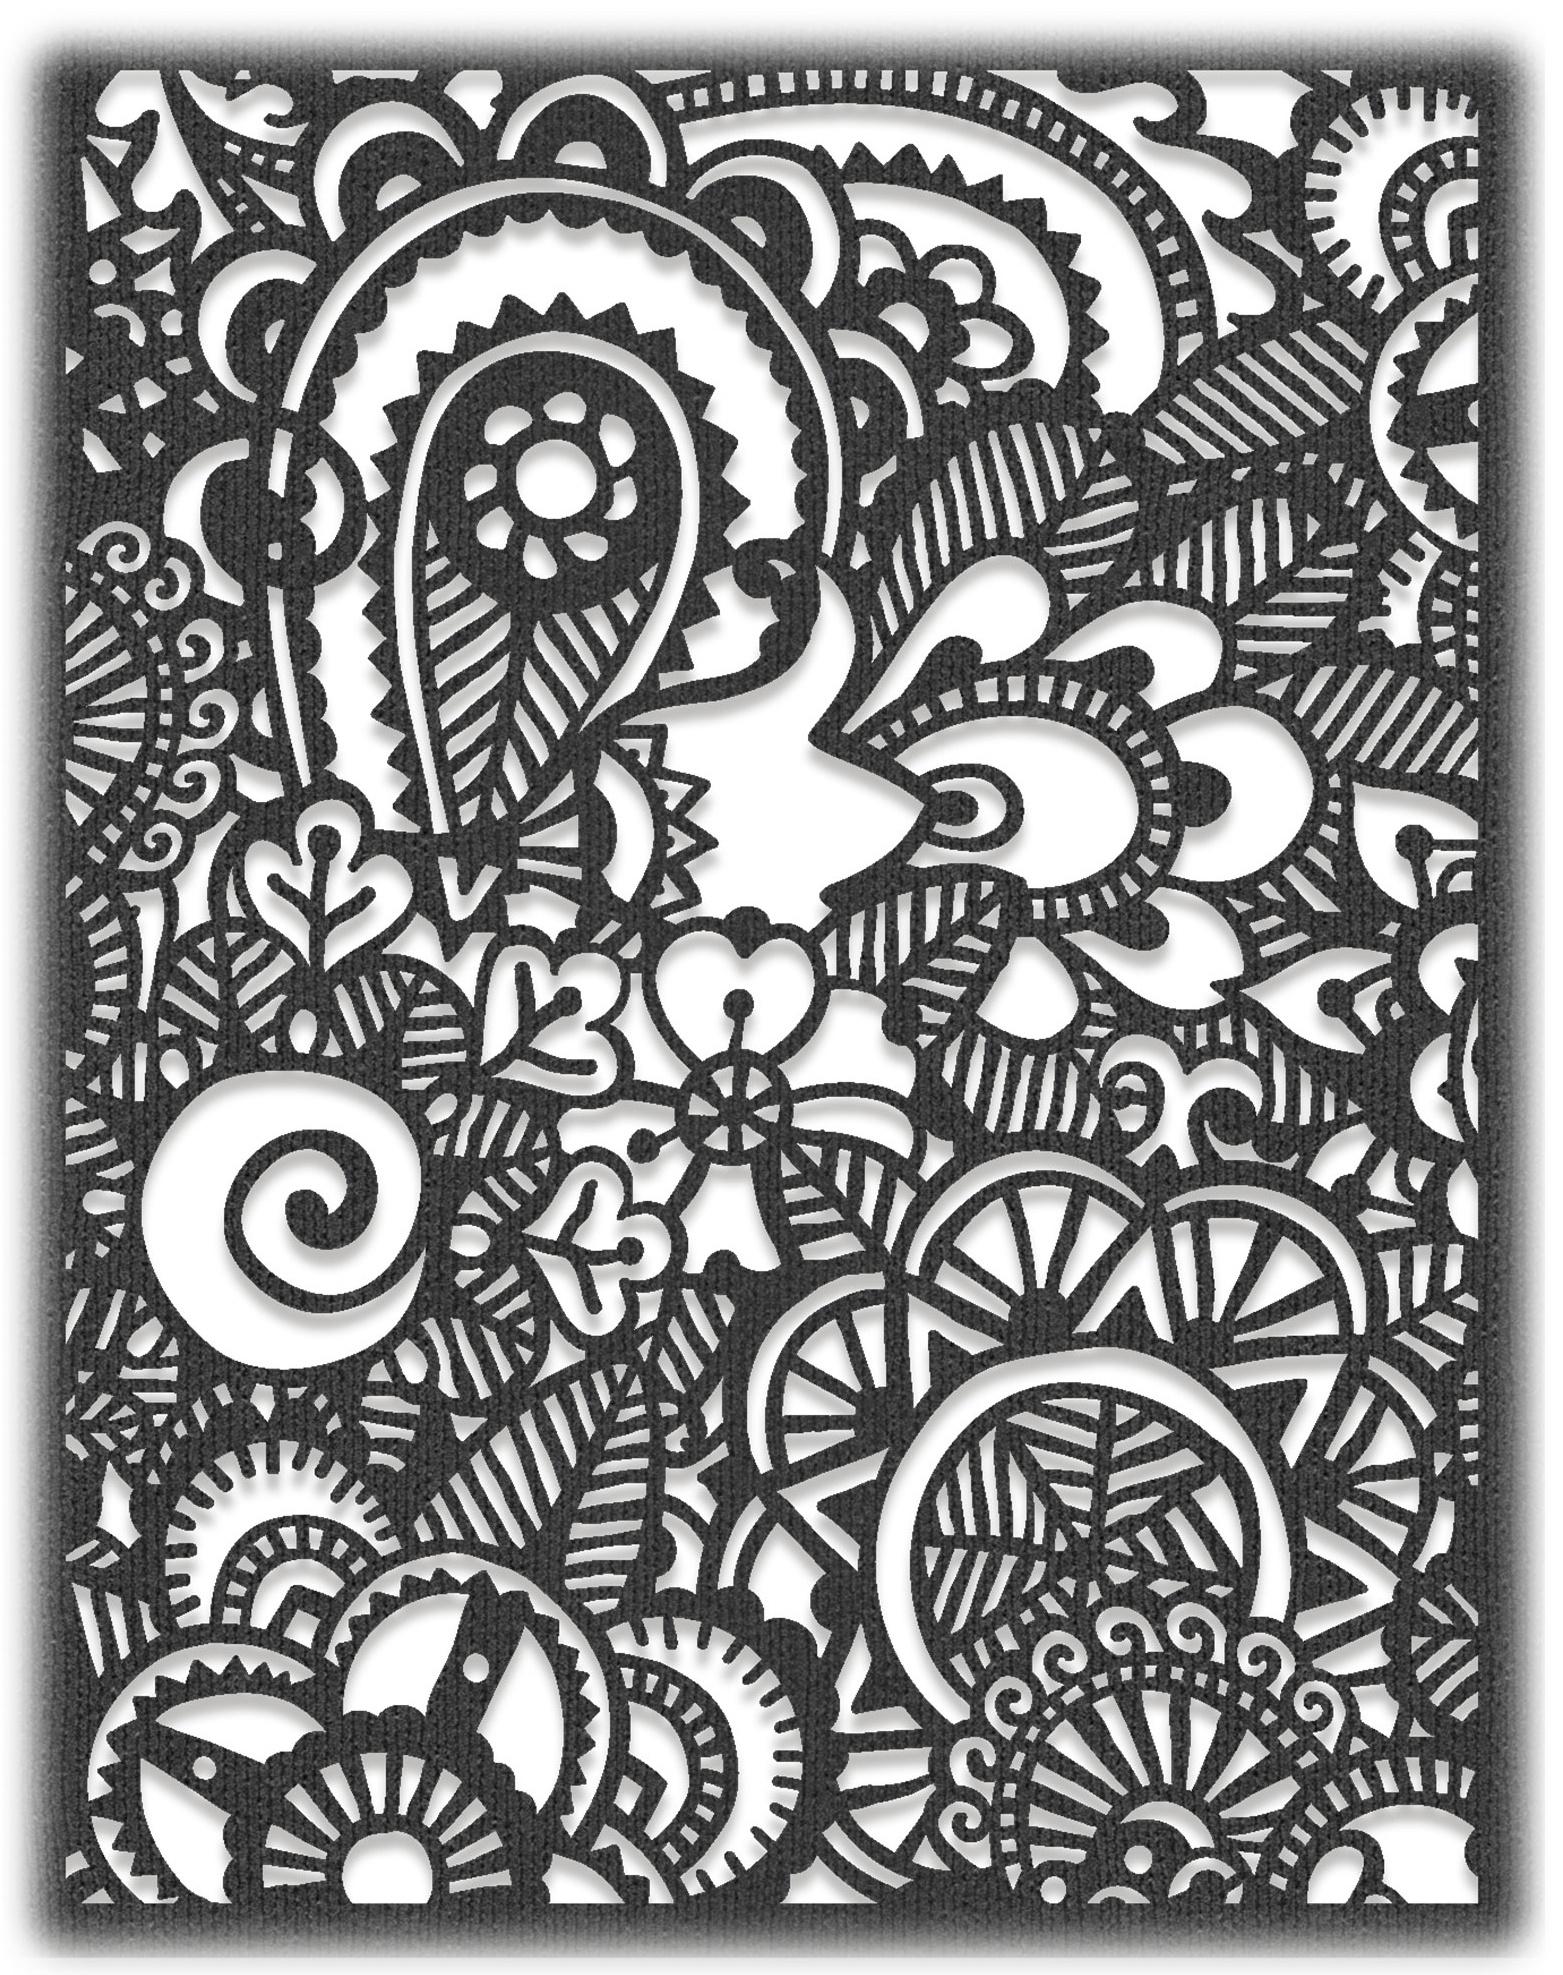 Sizzix Thinlits Die By Tim Holtz-Doodle Art #2